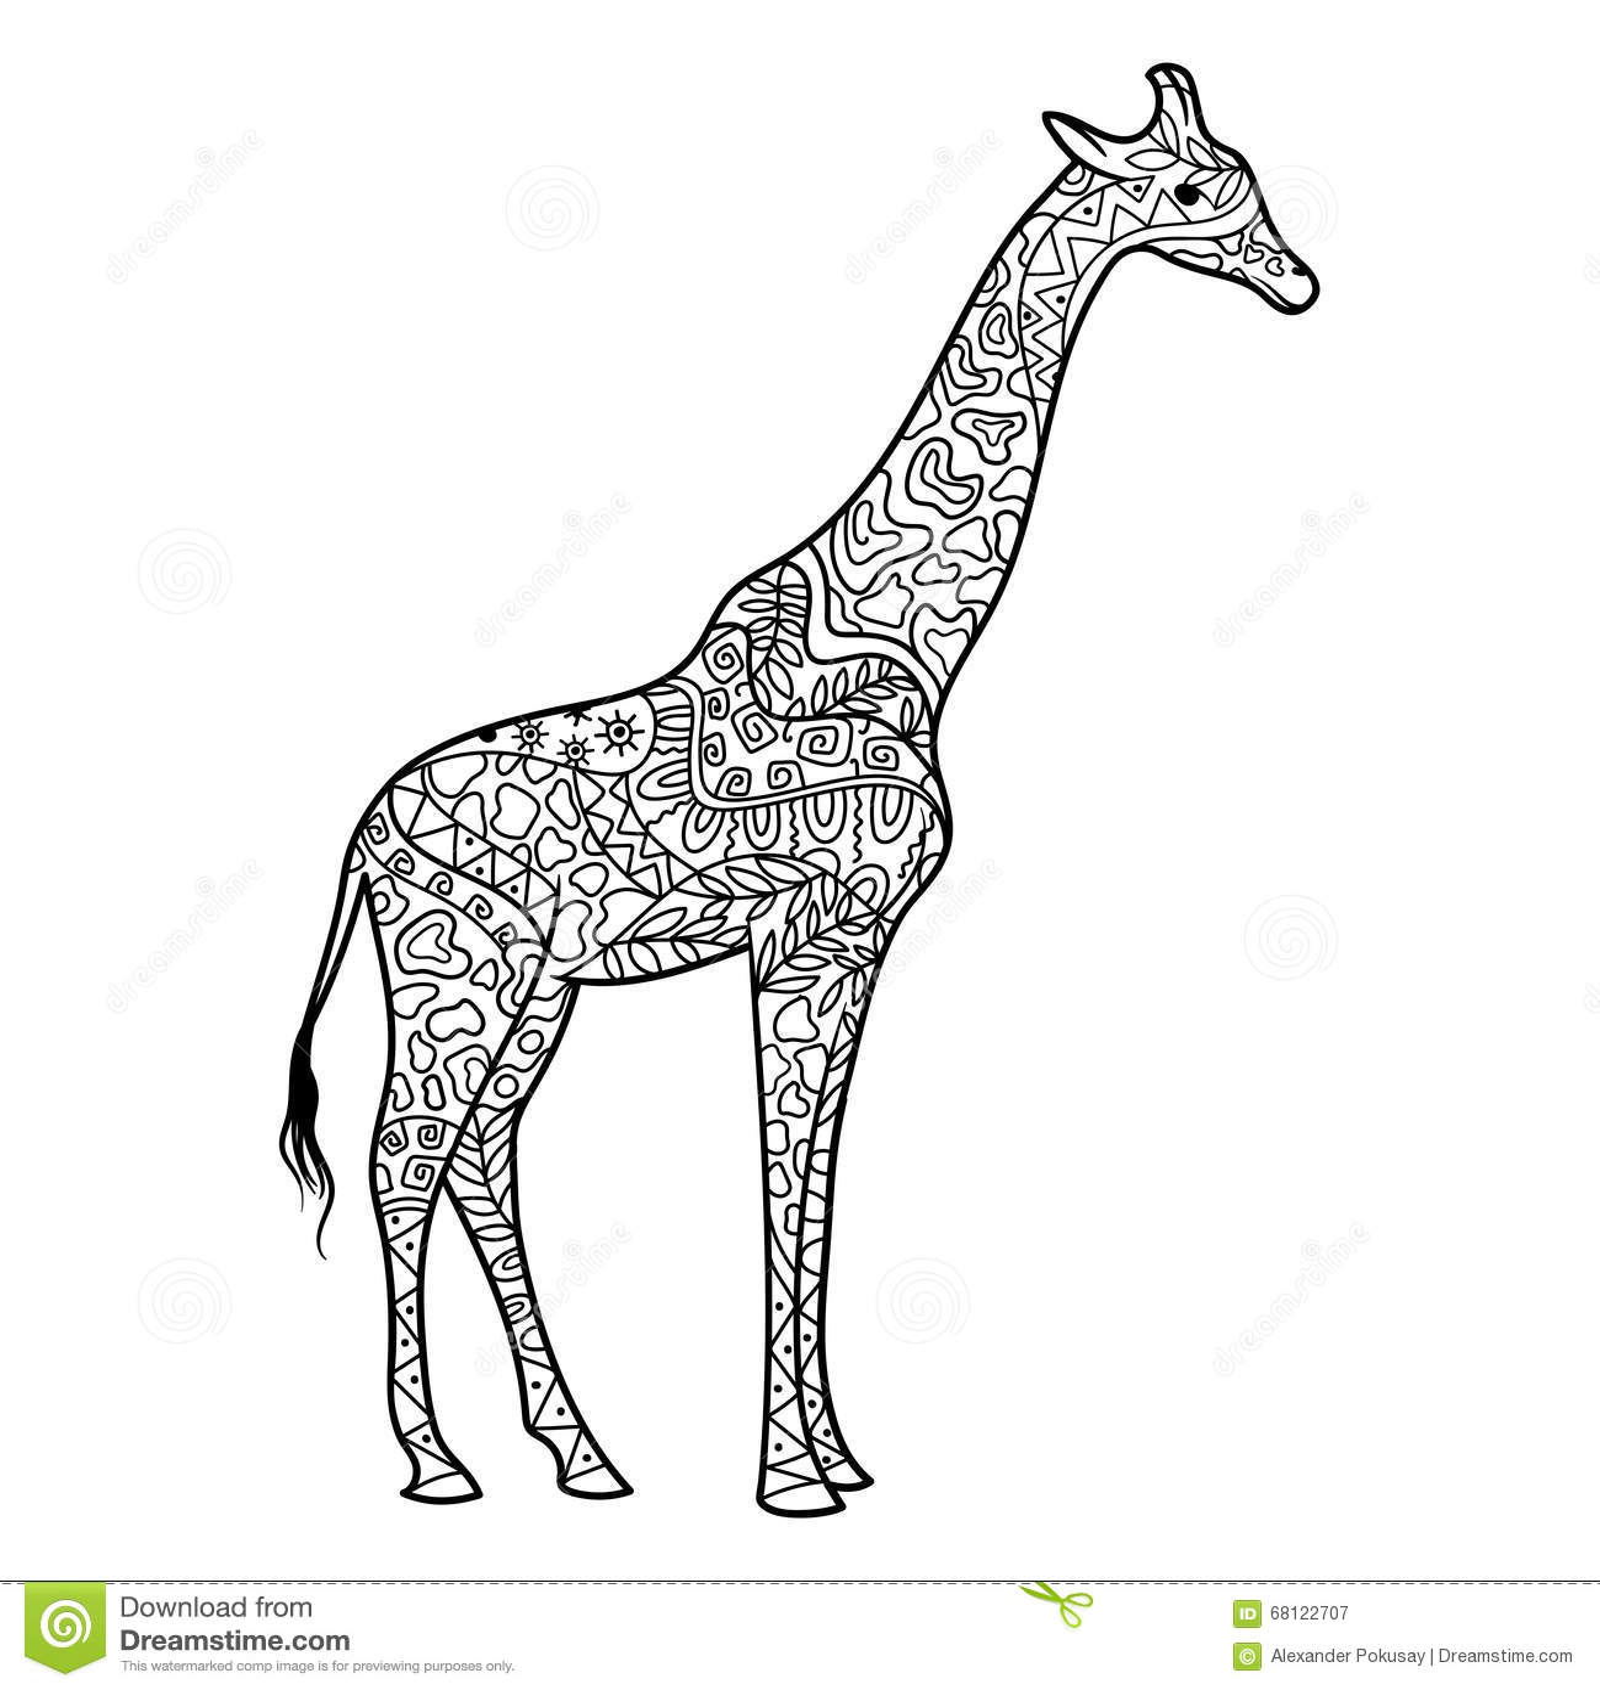 Ze zen inspiration coloring book - Giraffe Coloring Book For Adults Vector Download Image Ze Zen Inspiration